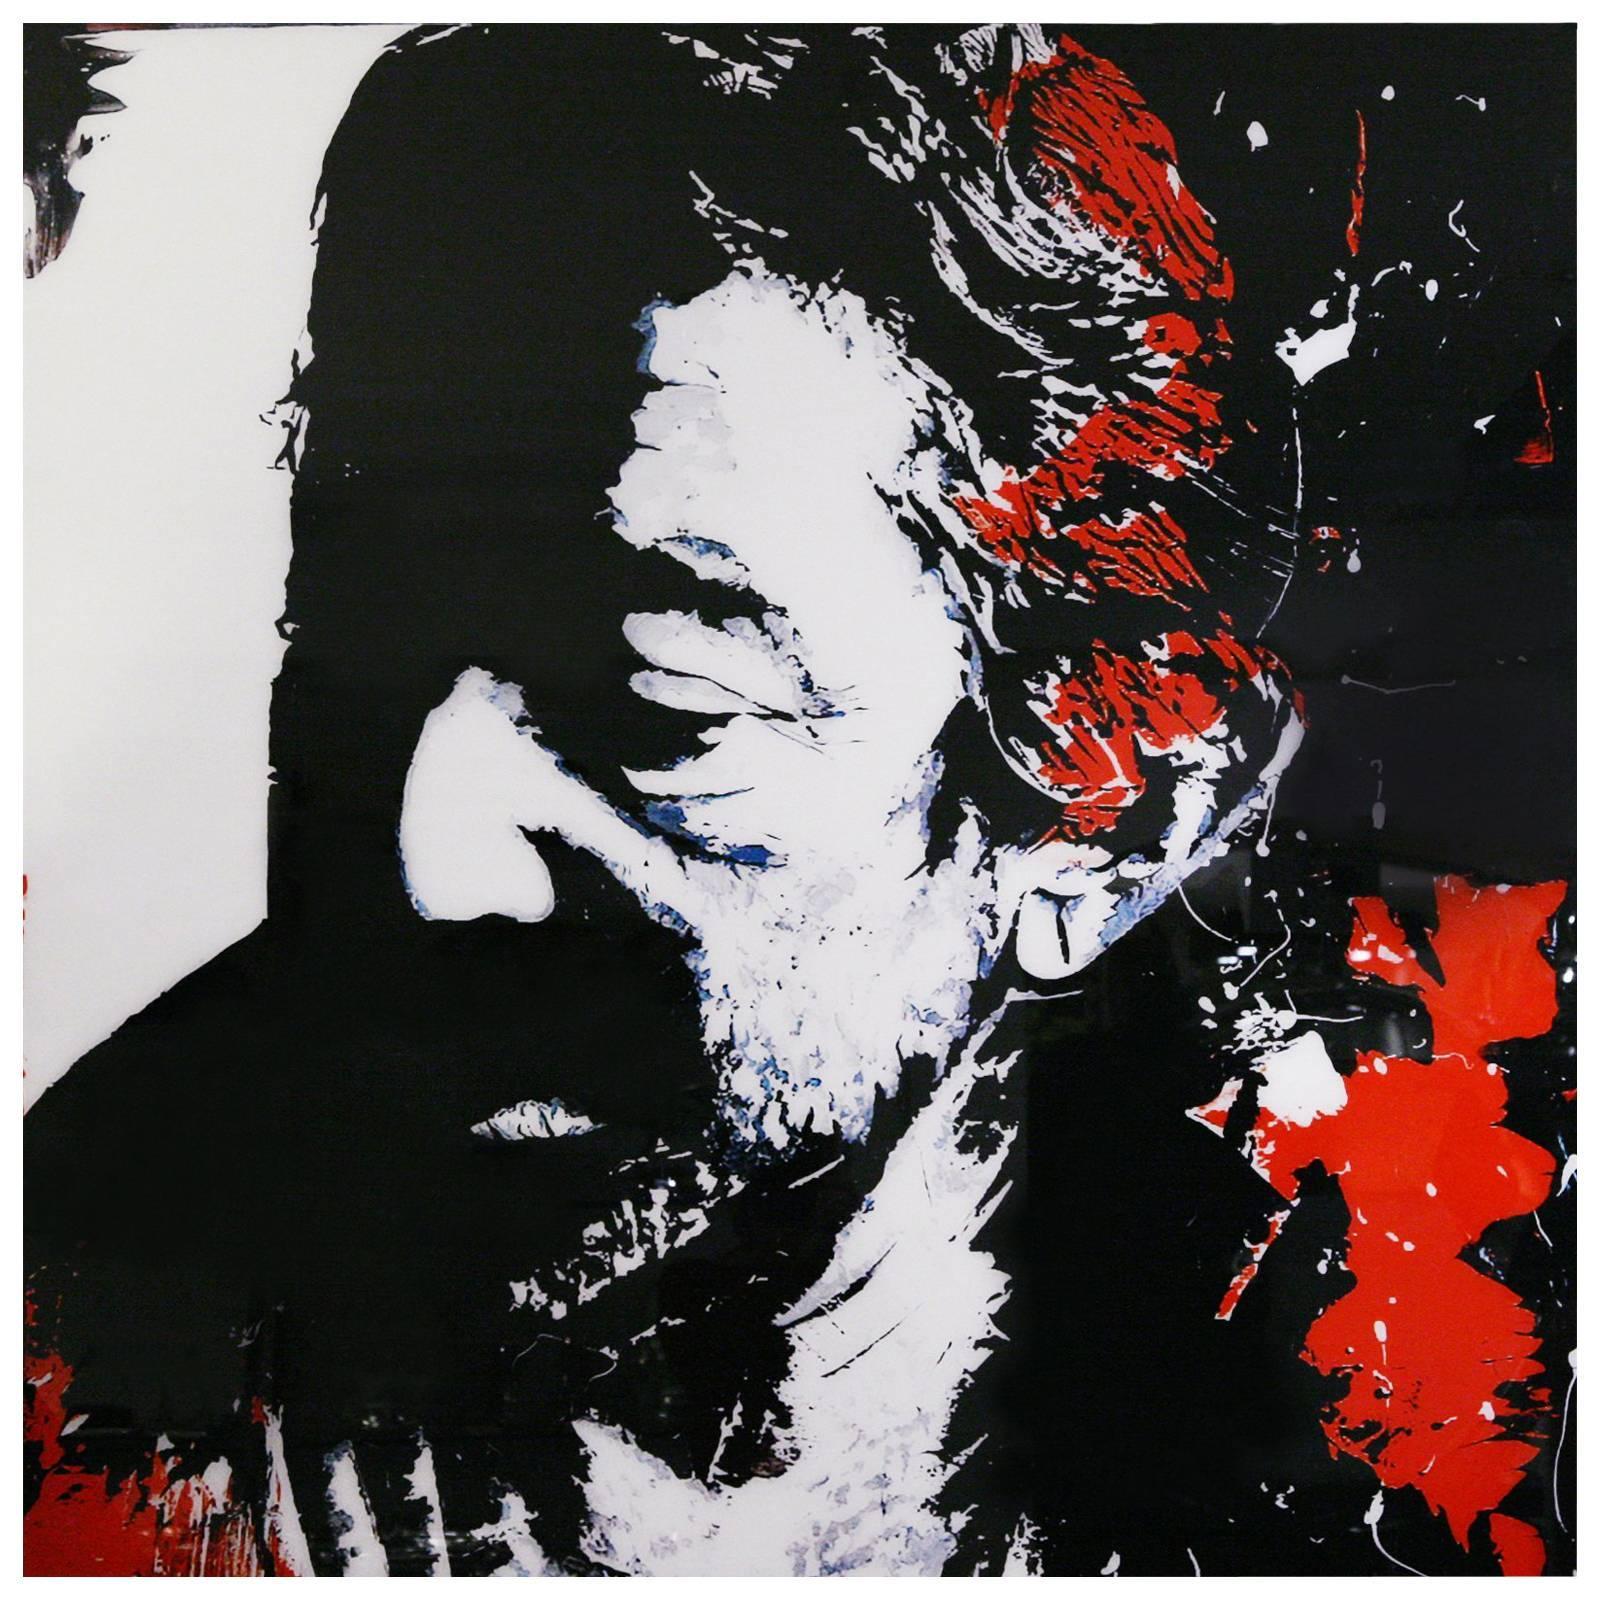 Serge Gainsbourg Photography on Plexiglass